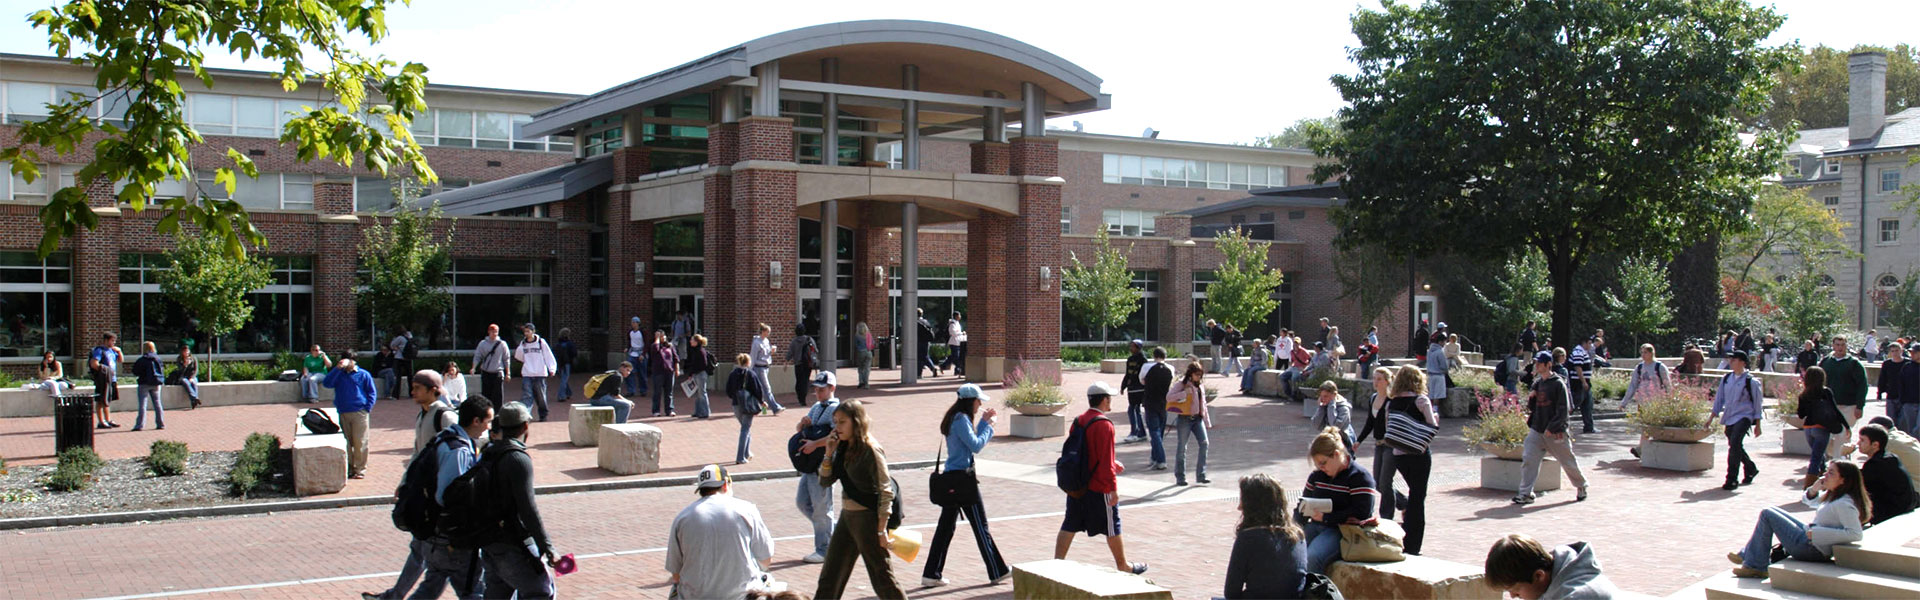 Hub-Robeson Center